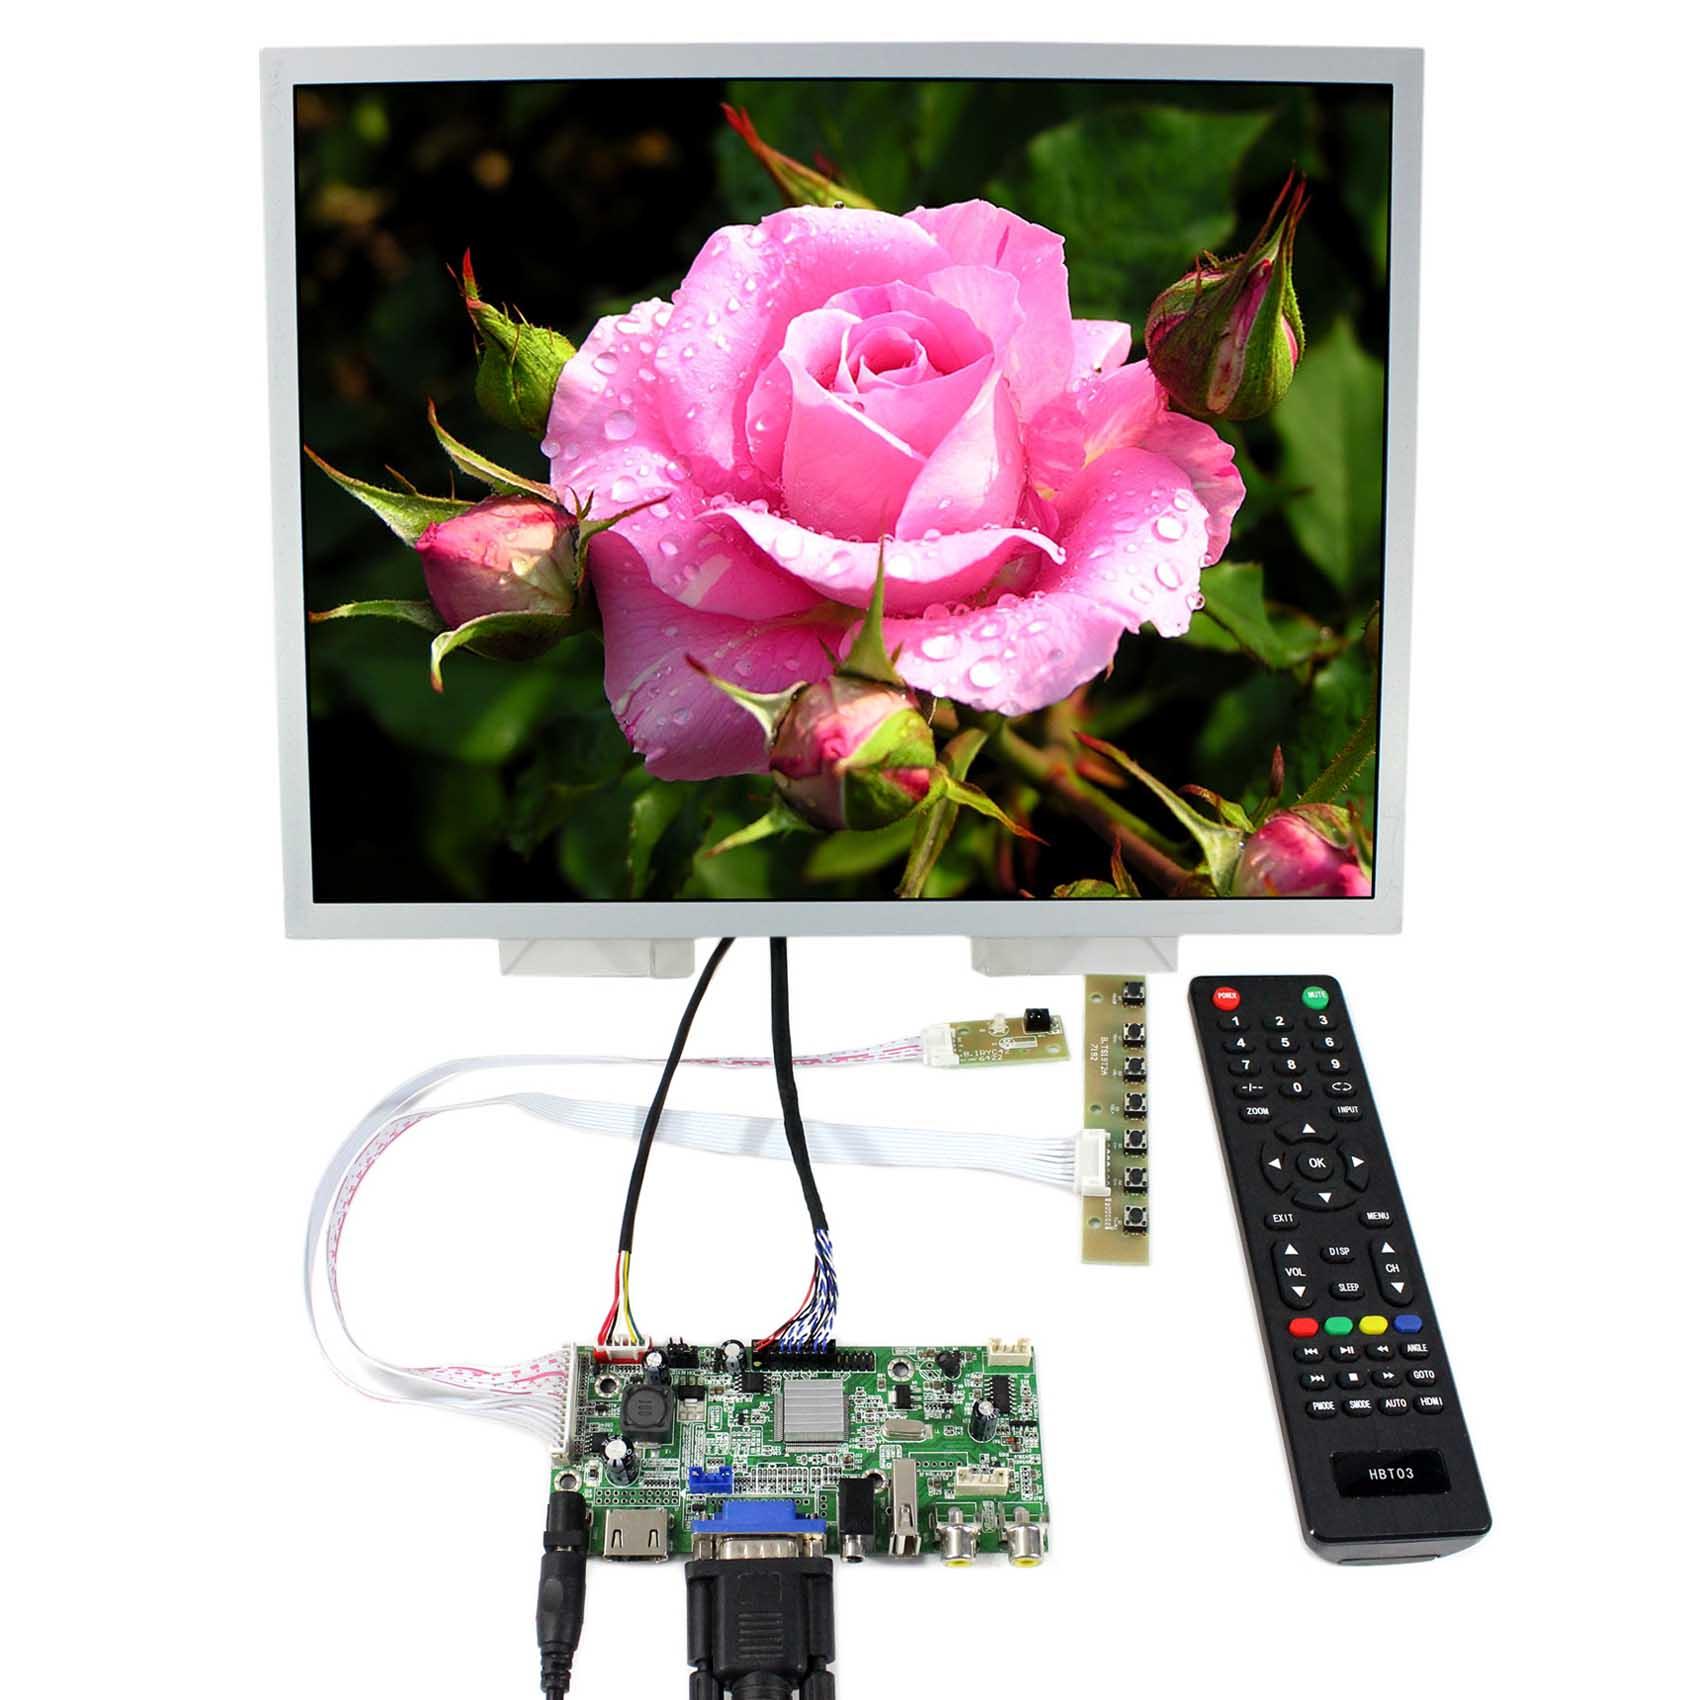 HDMI VGA 2AV USB аудио LCD плата драйвера 15 дюймов LQ150X1LG96 1024x768 ЖК дисплей